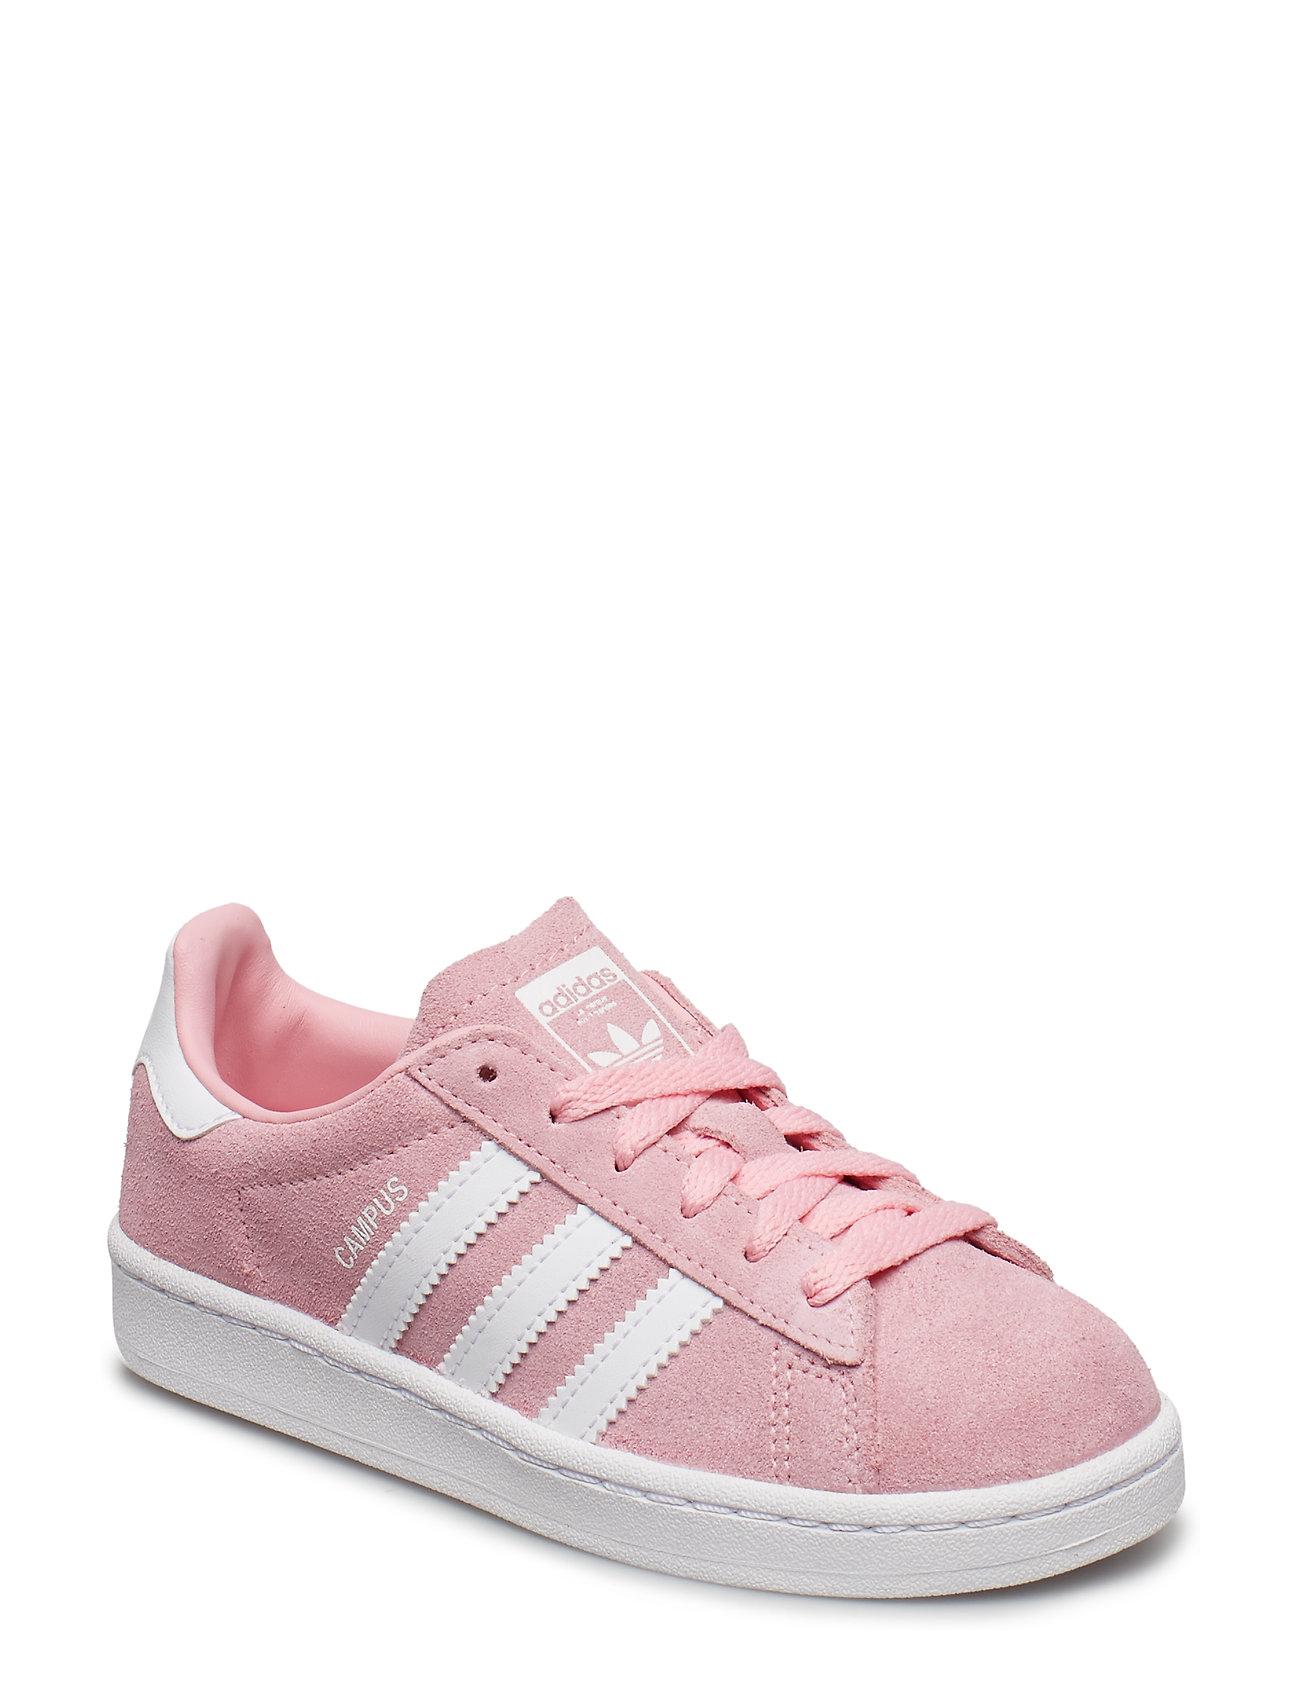 5a68a32ec26 LEGIVY/FTWWHT/FTWWHT Adidas Campus C sneakers for børn - Pashion.dk